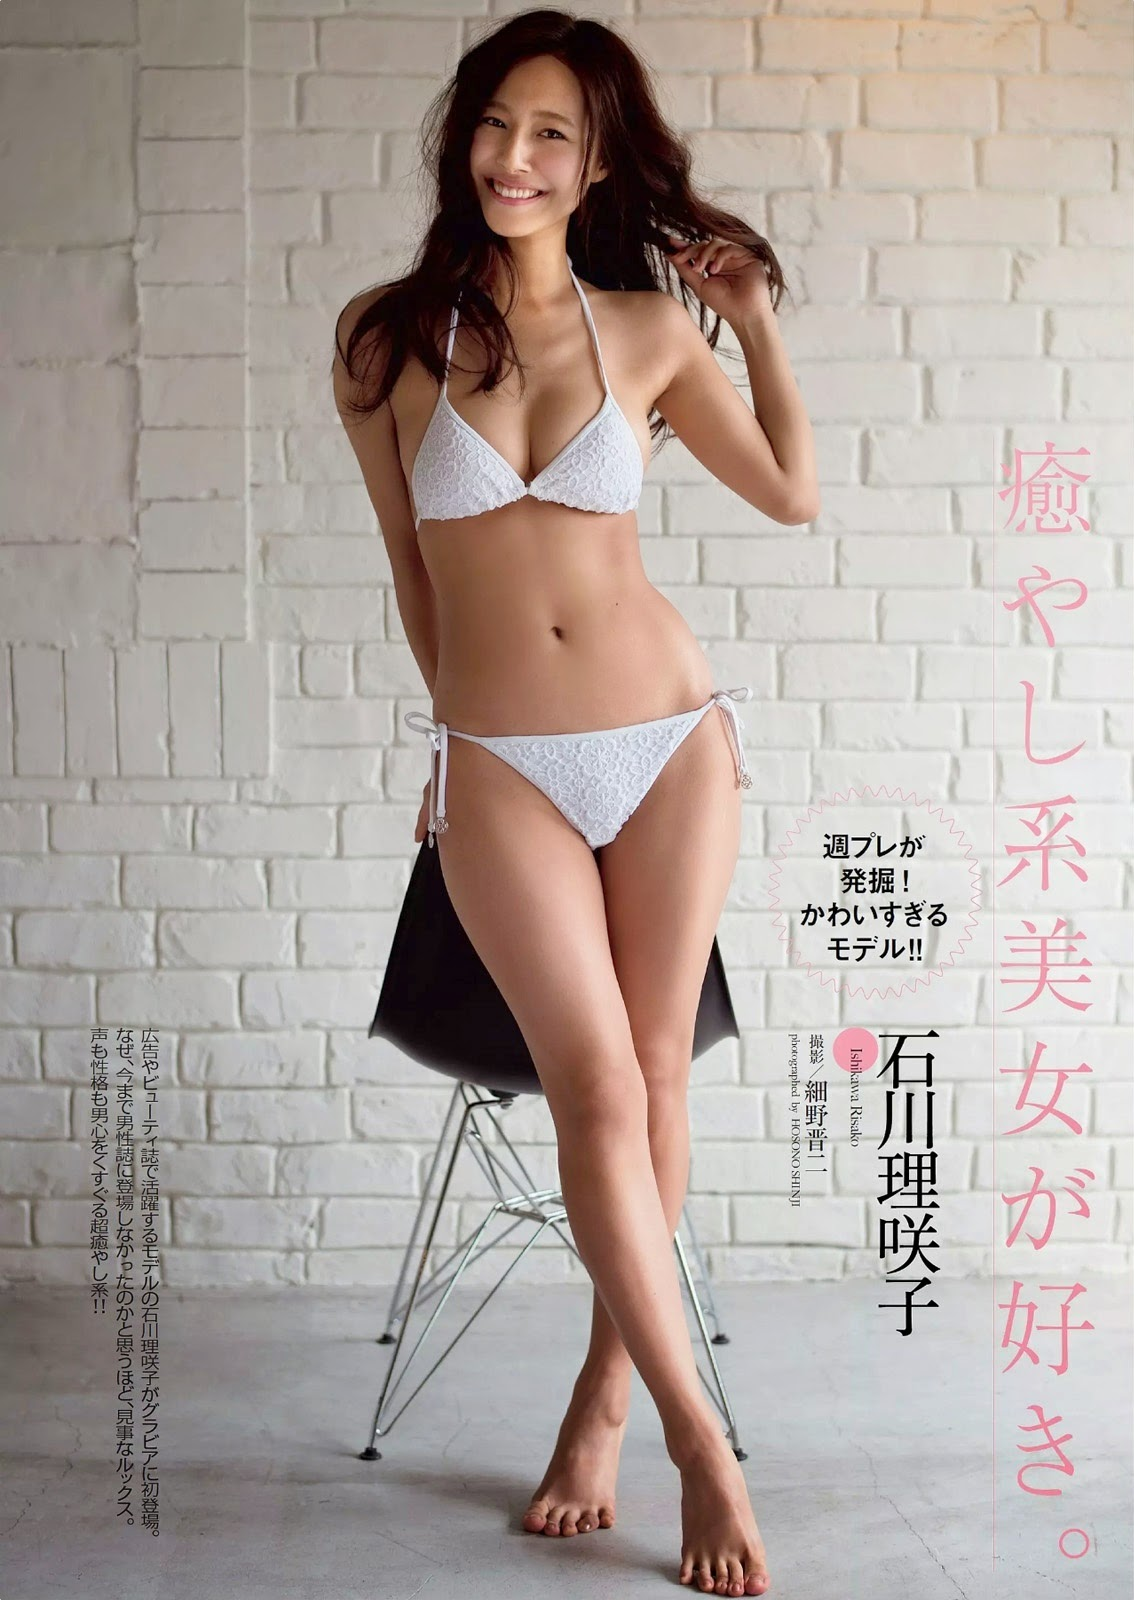 Ishikawa Risako 石川理咲子 Weekly Playboy No 5 2015 Photos 2